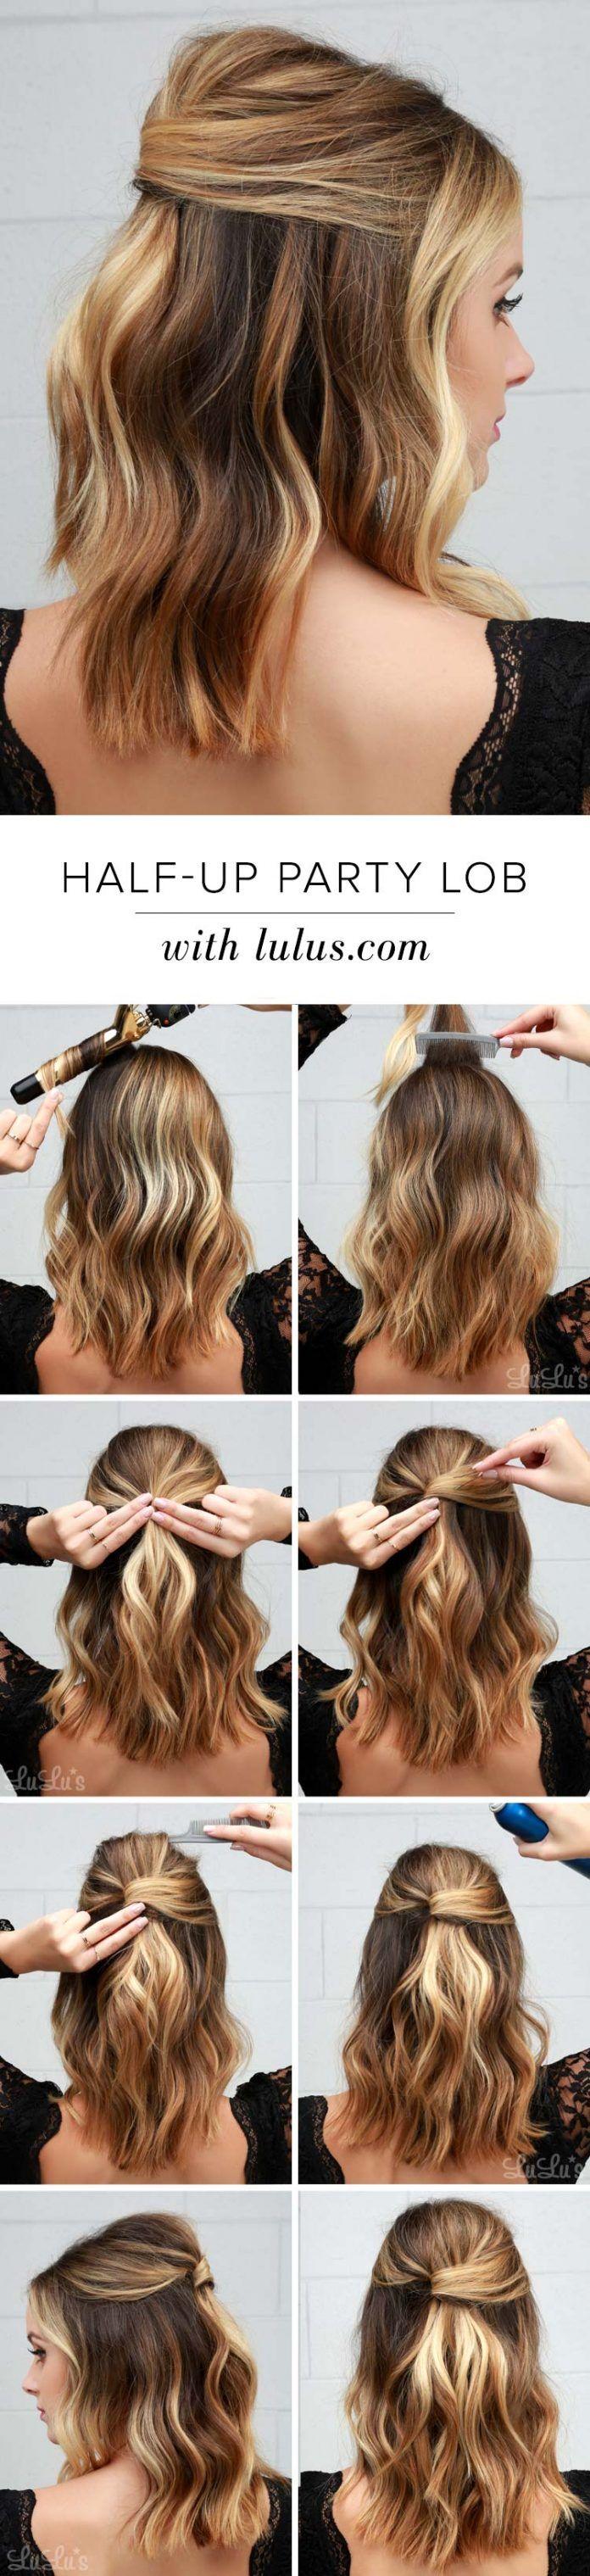 Remarkable 1000 Ideas About Formal Hairstyles Down On Pinterest Hair Half Short Hairstyles Gunalazisus